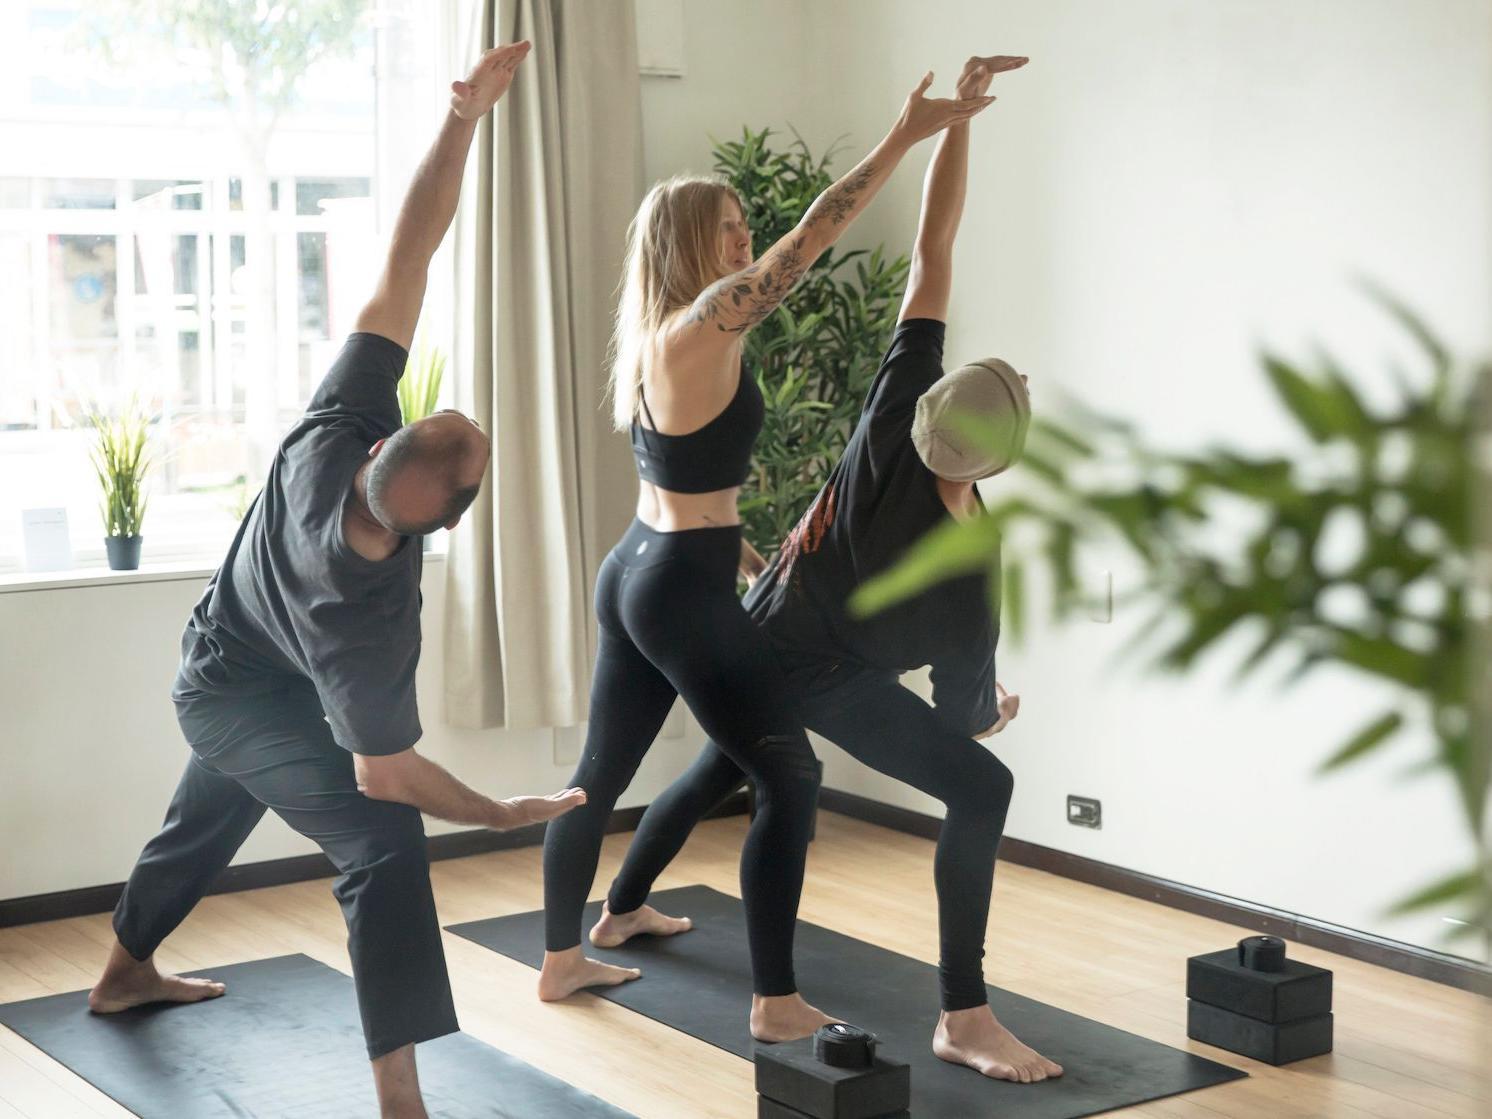 Yoga lessons in Powder yoga in Niseko near Chatrium Niseko Japan